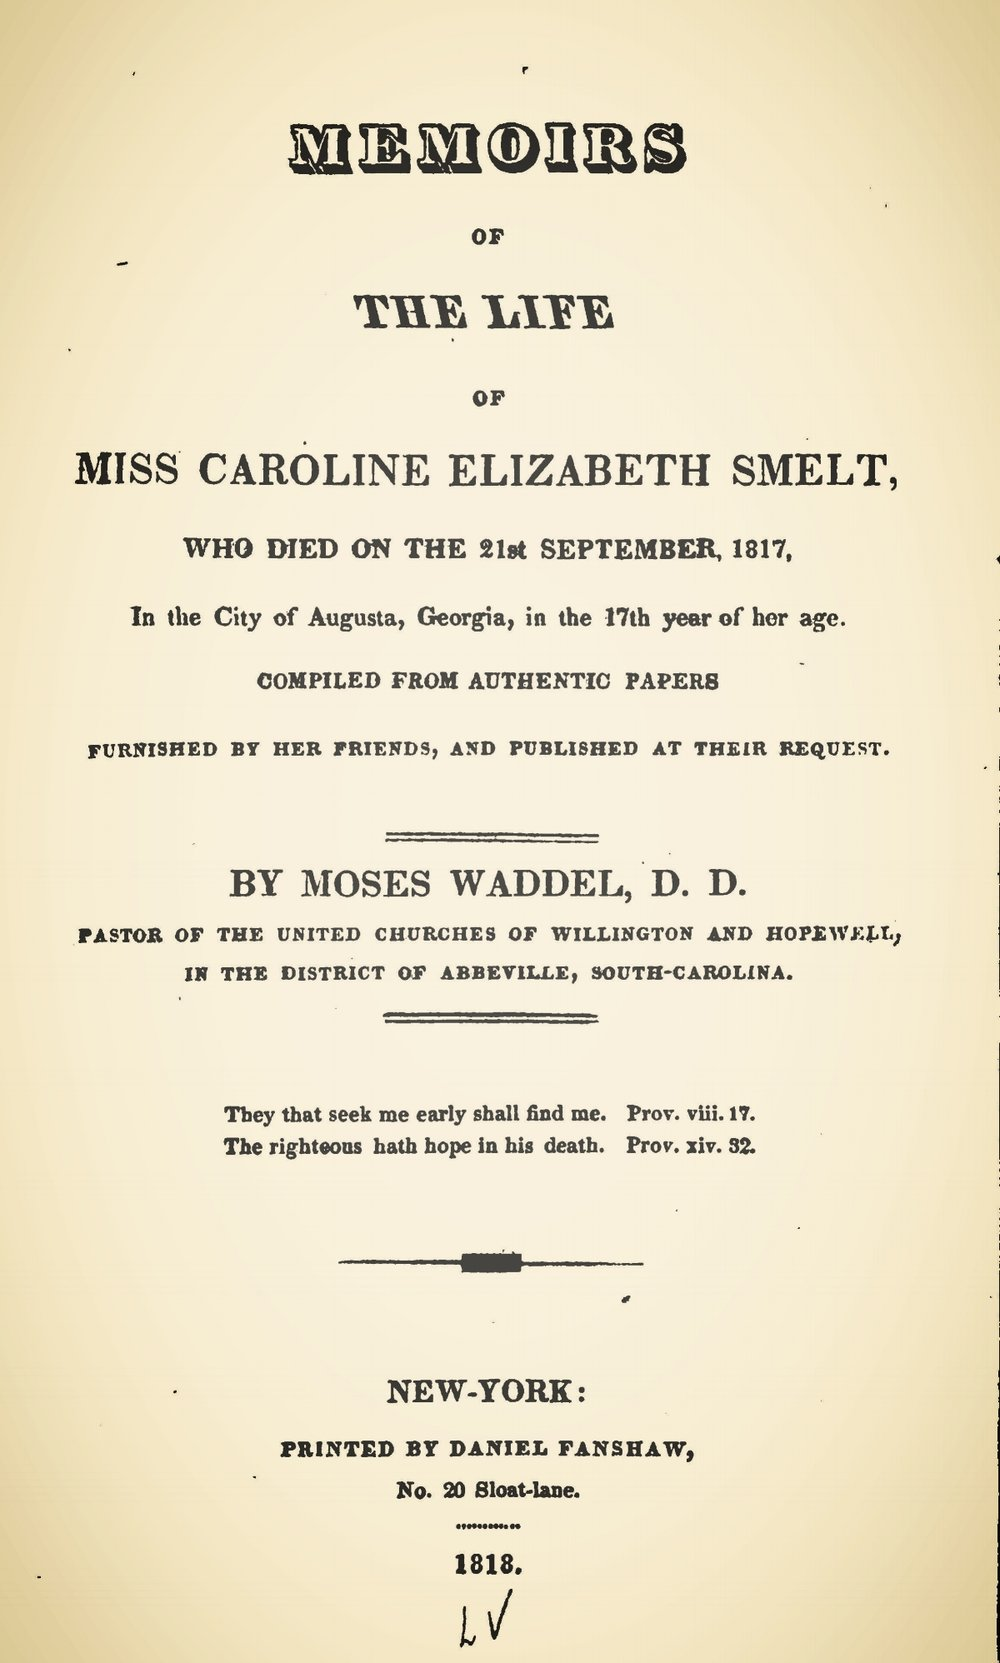 Waddel, Moses, Memoirs of the Life of Miss Caroline Elizabeth Smelt Title Page.jpg